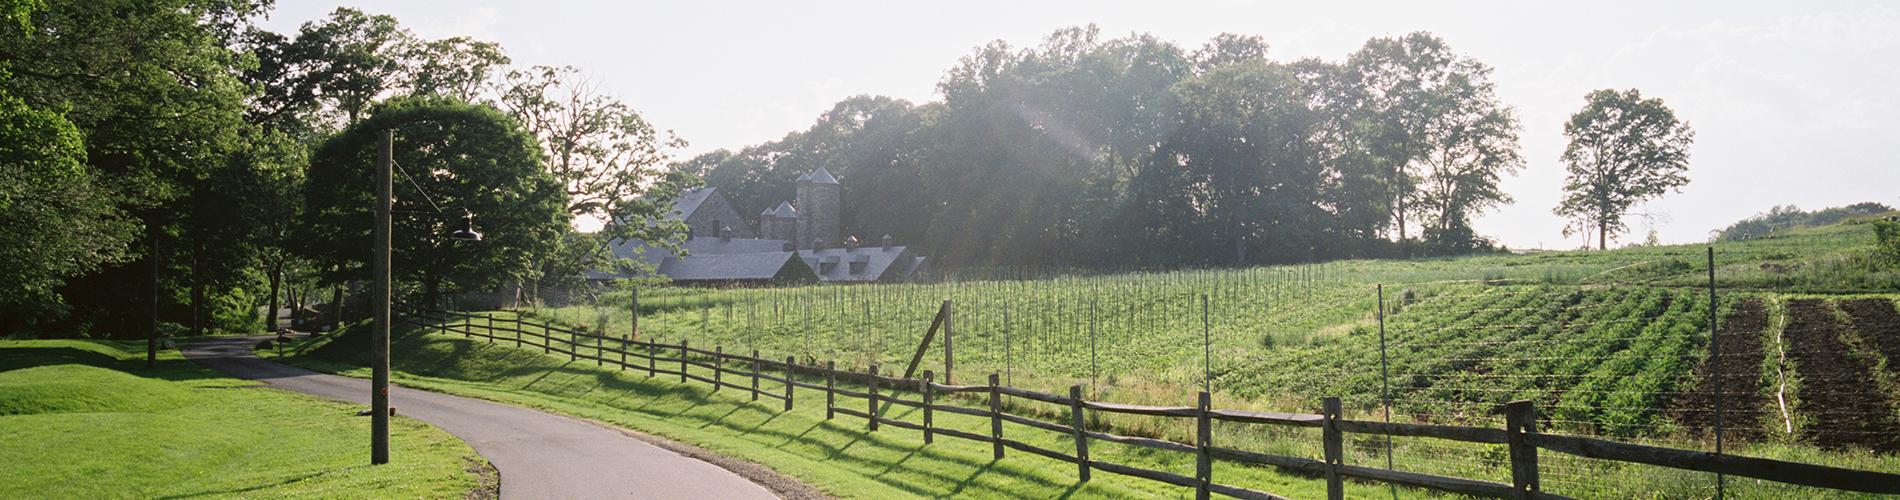 Stone Barns photo